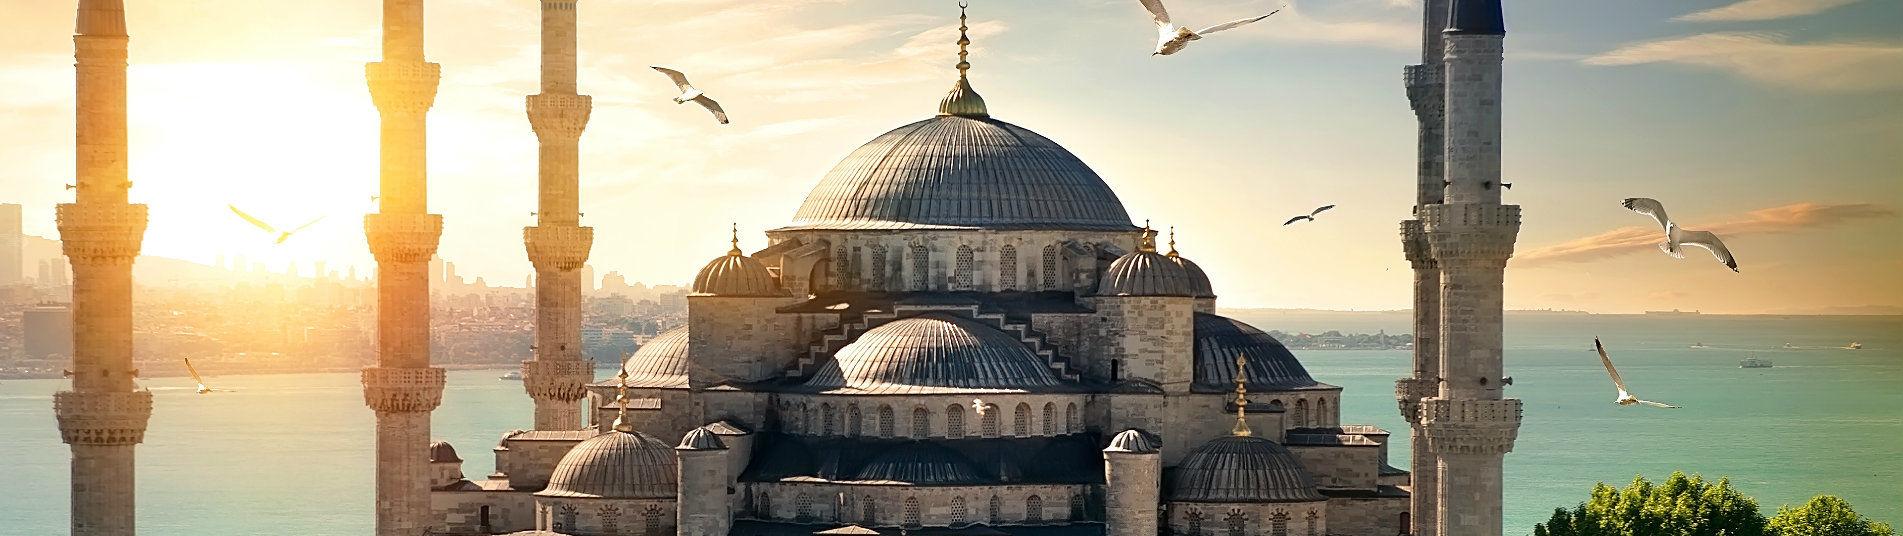 Mosquée Bleue à Istanbul Turquie